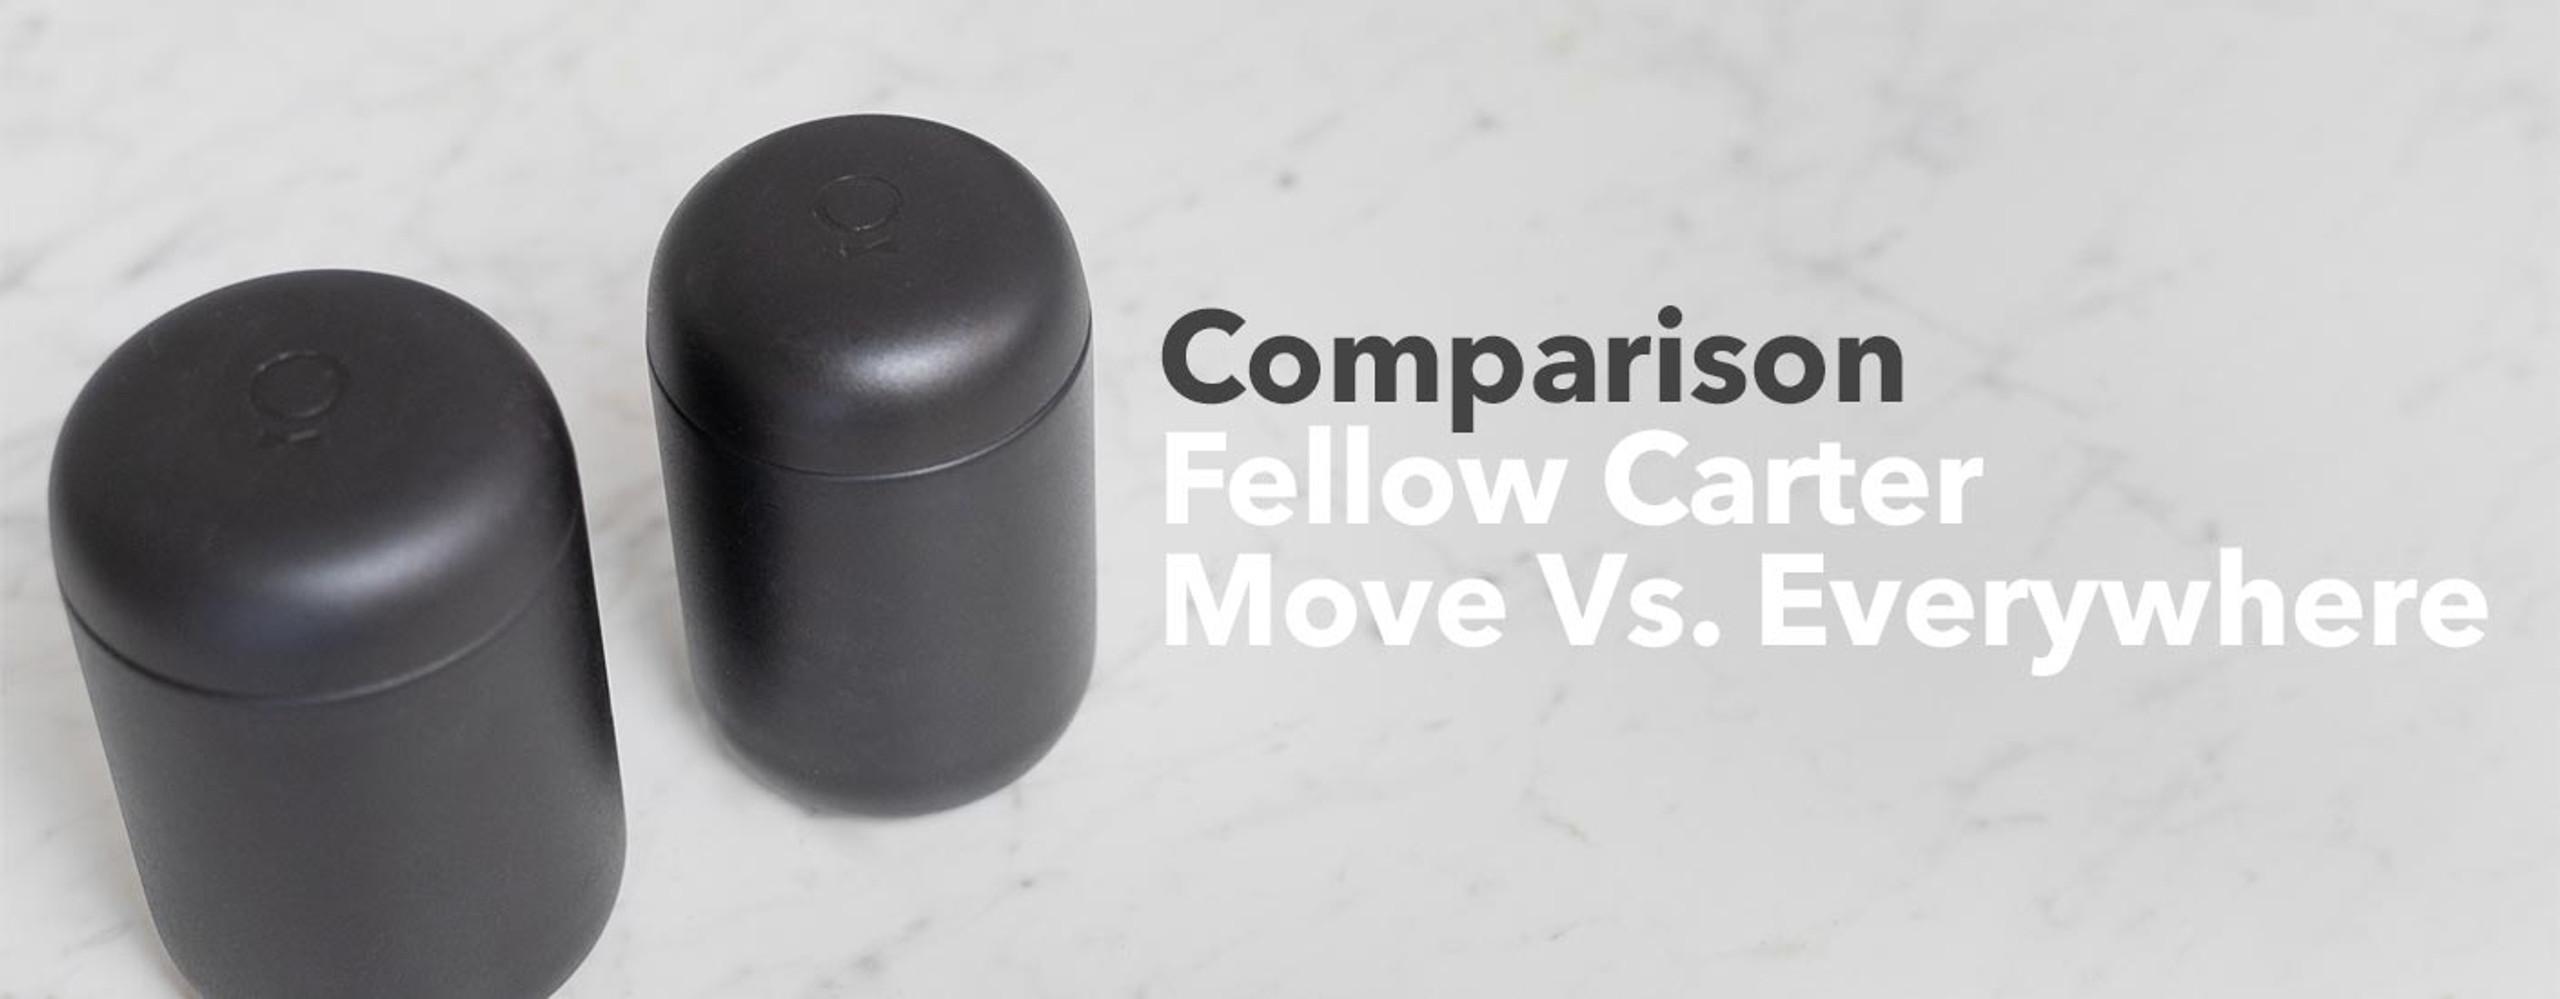 Fellow Carter Move vs. Everywhere